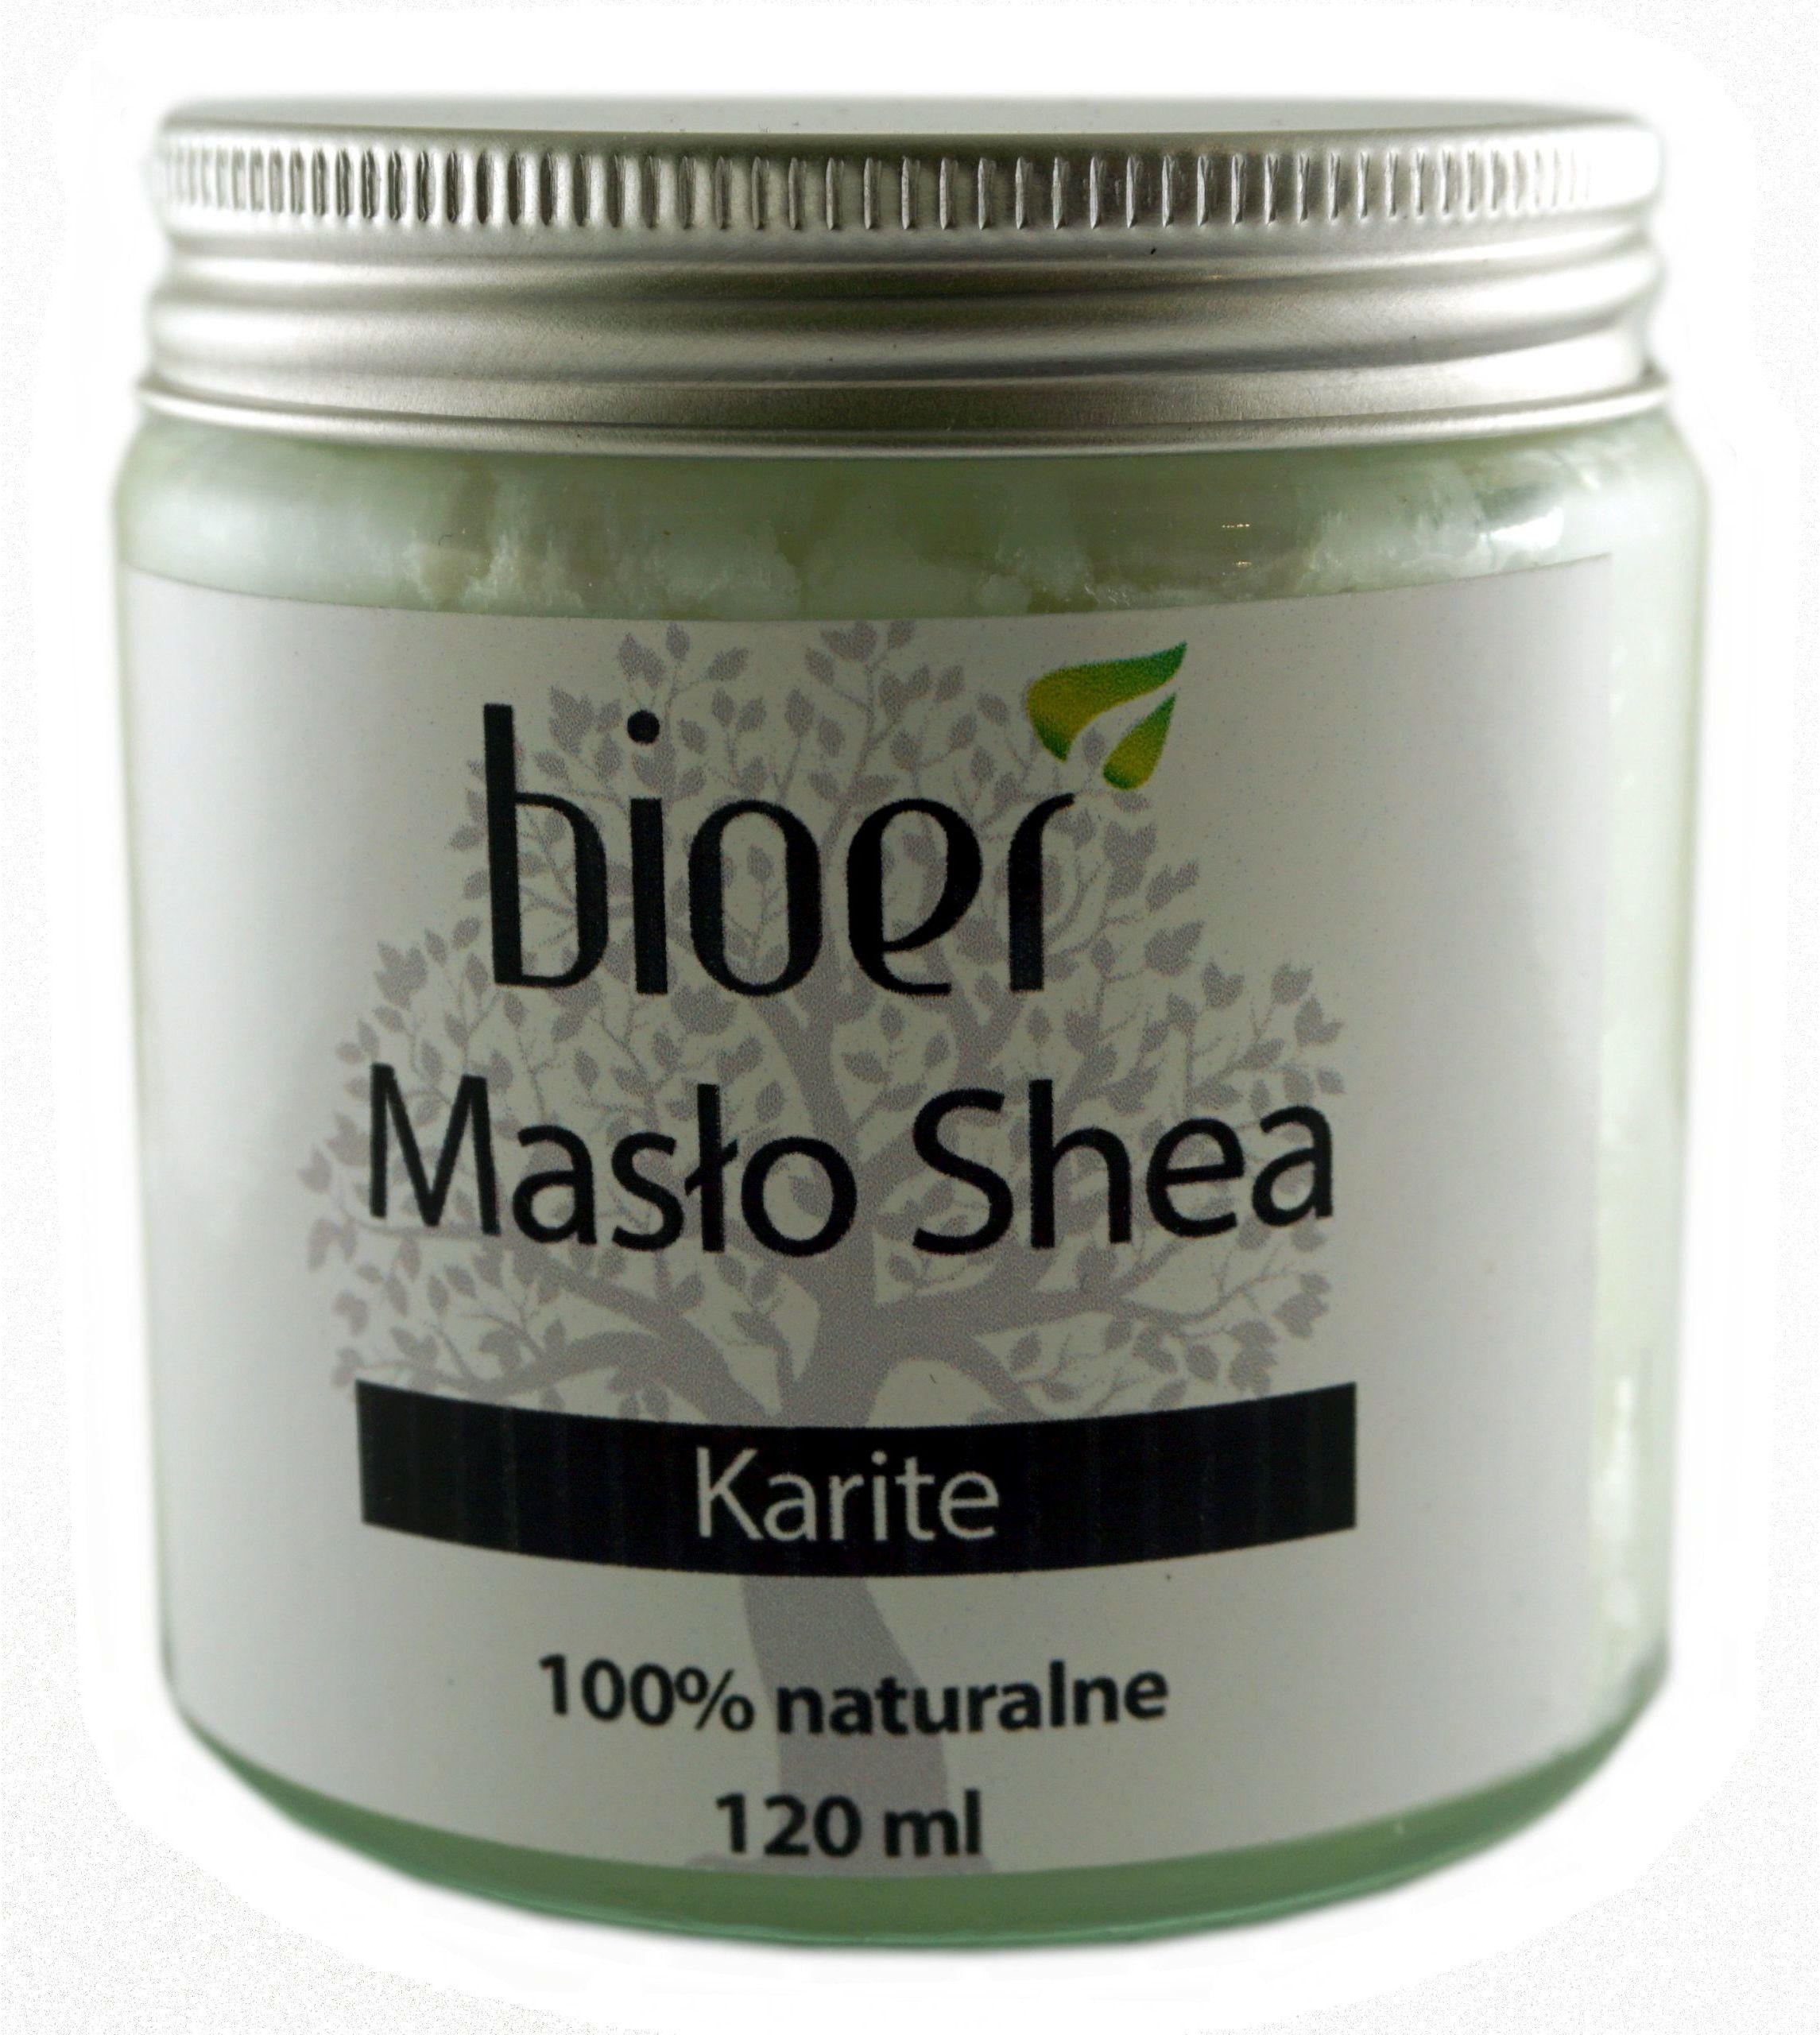 Masło Shea Karite - 120ml - Bioer